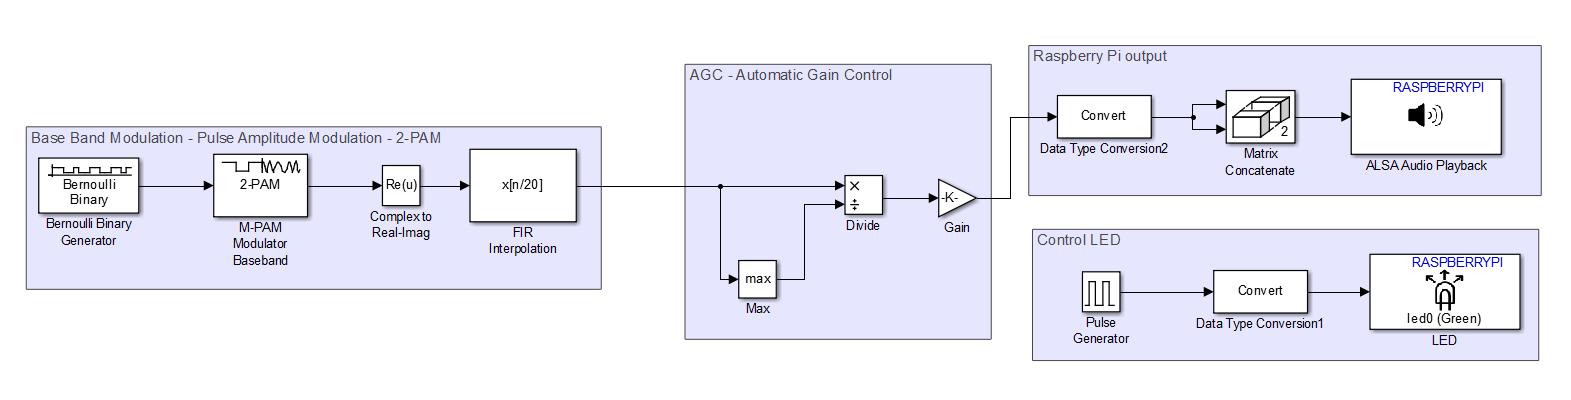 Pulse Amplitude Modulation - Raspberry Pi 2 model B